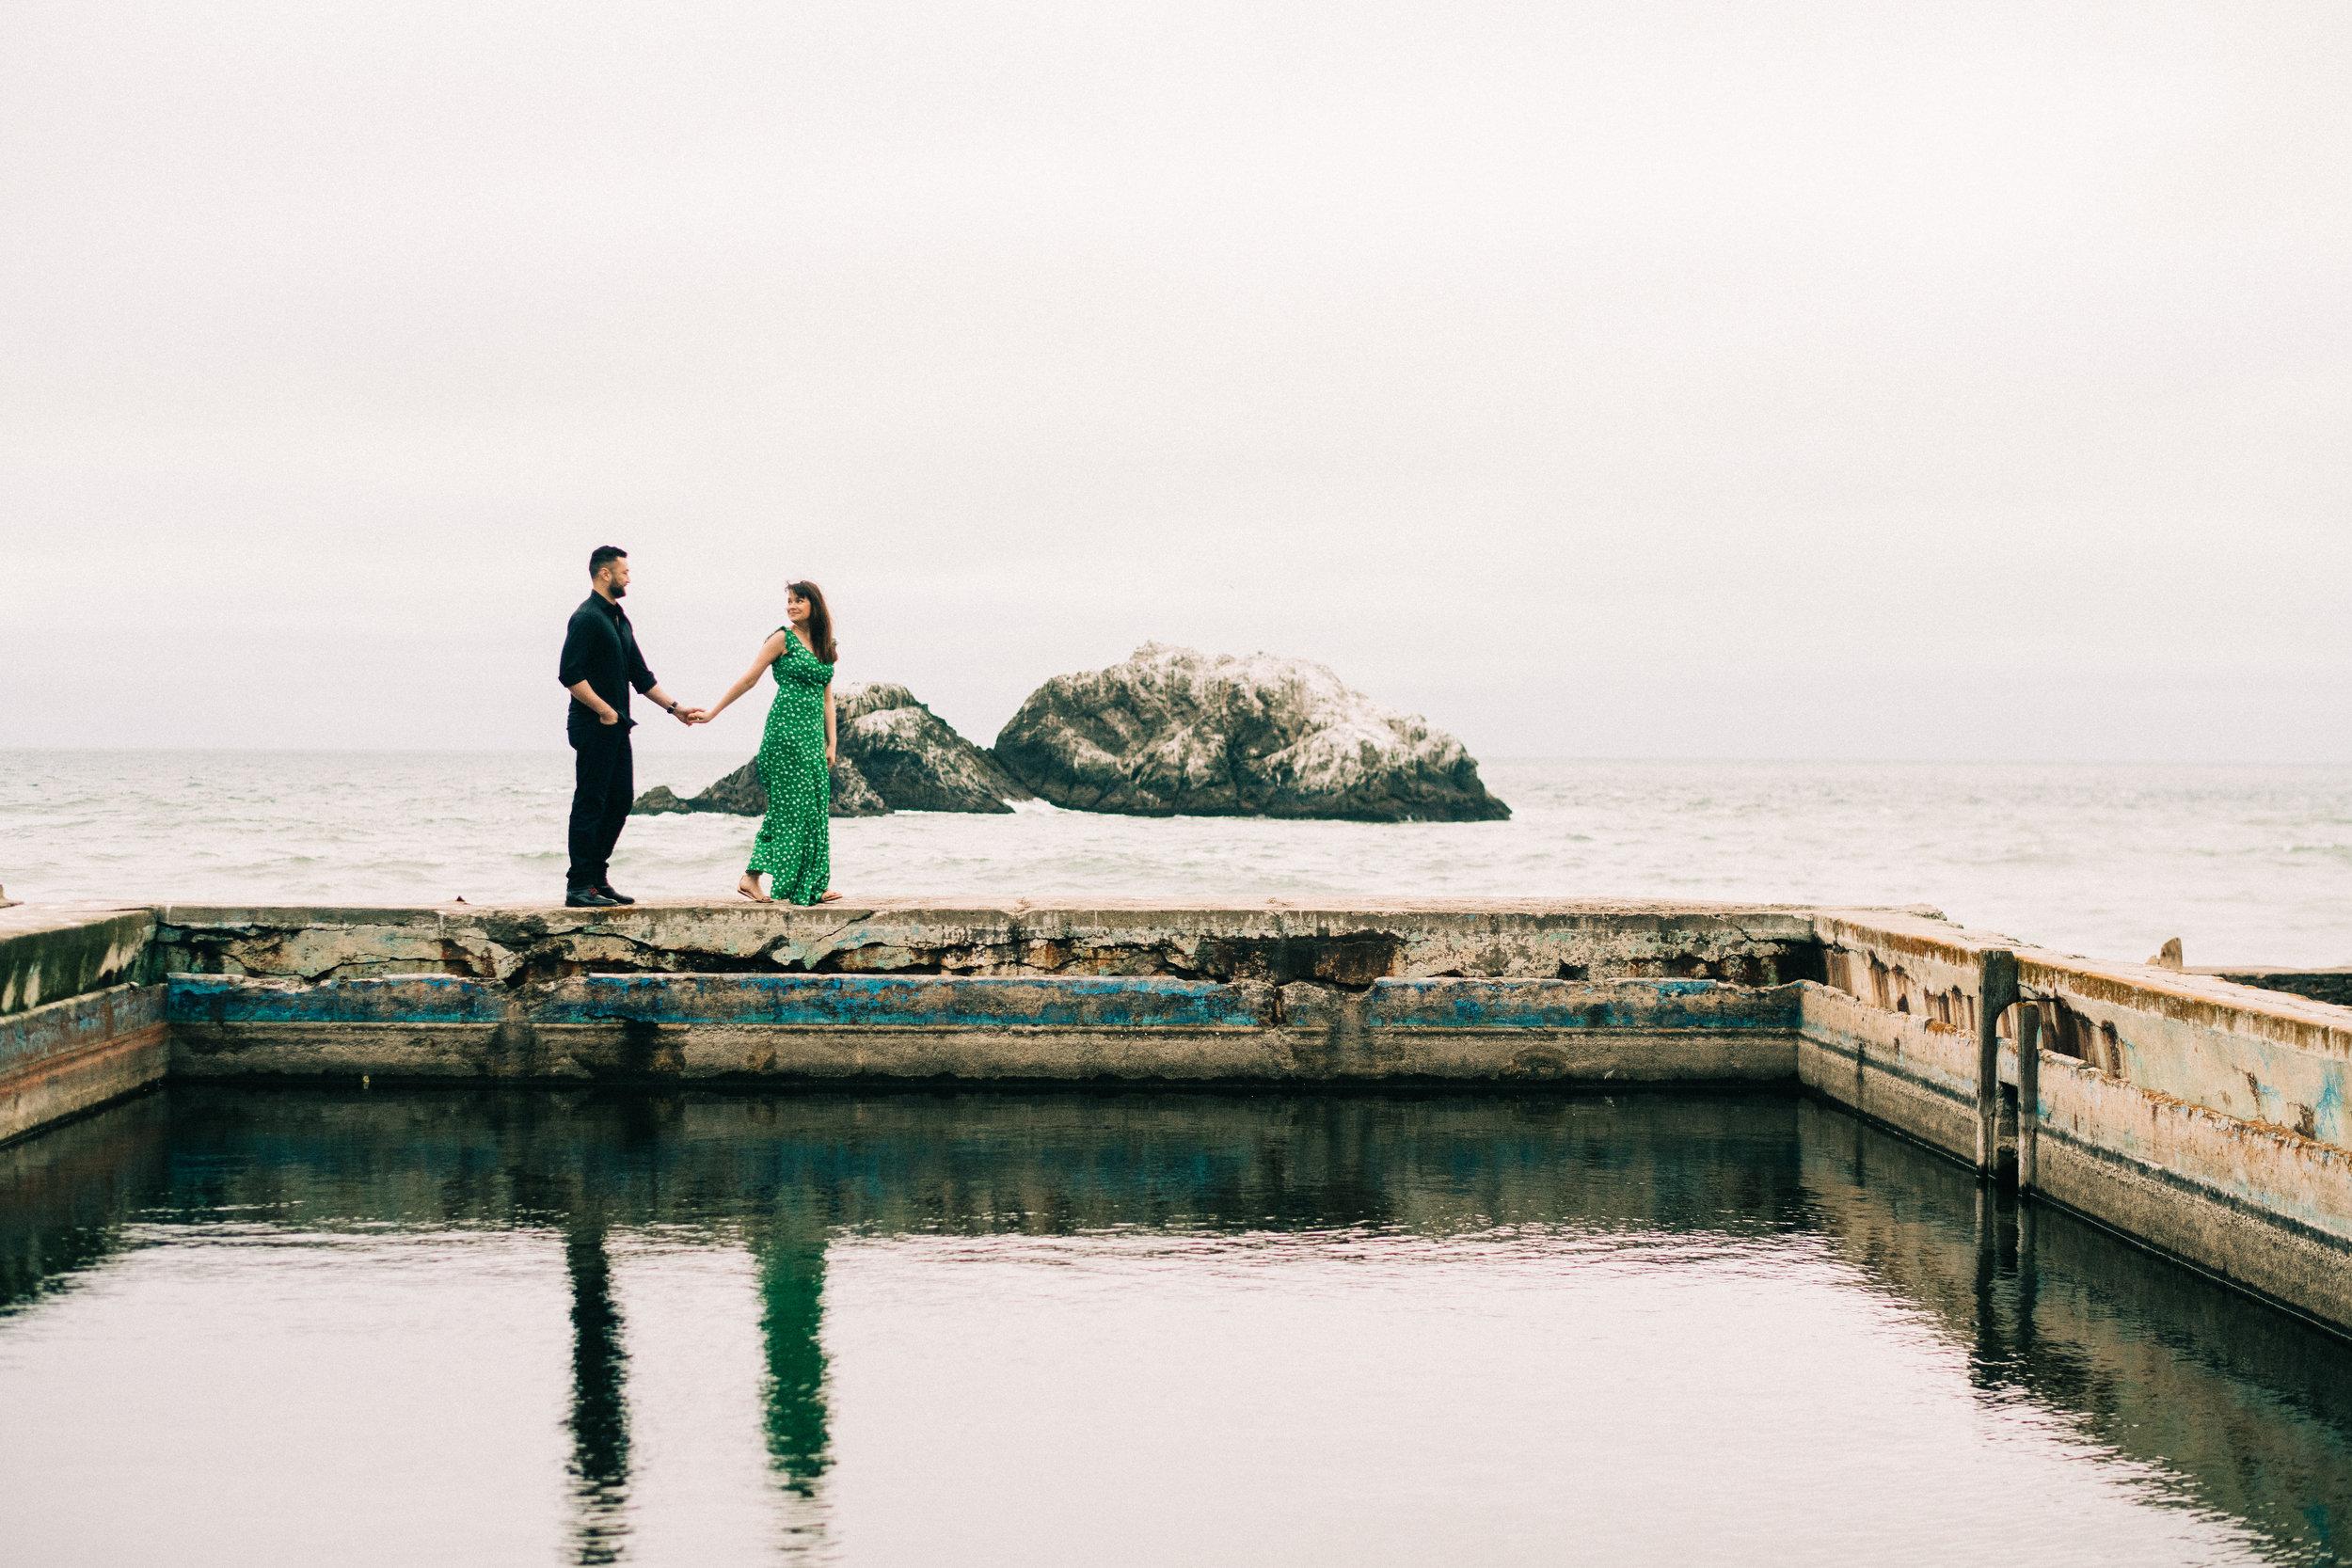 bay area lands end sutro baths oakland san francisco engagement wedding nontraditional fun creative eclectic photographer magic-286.jpg